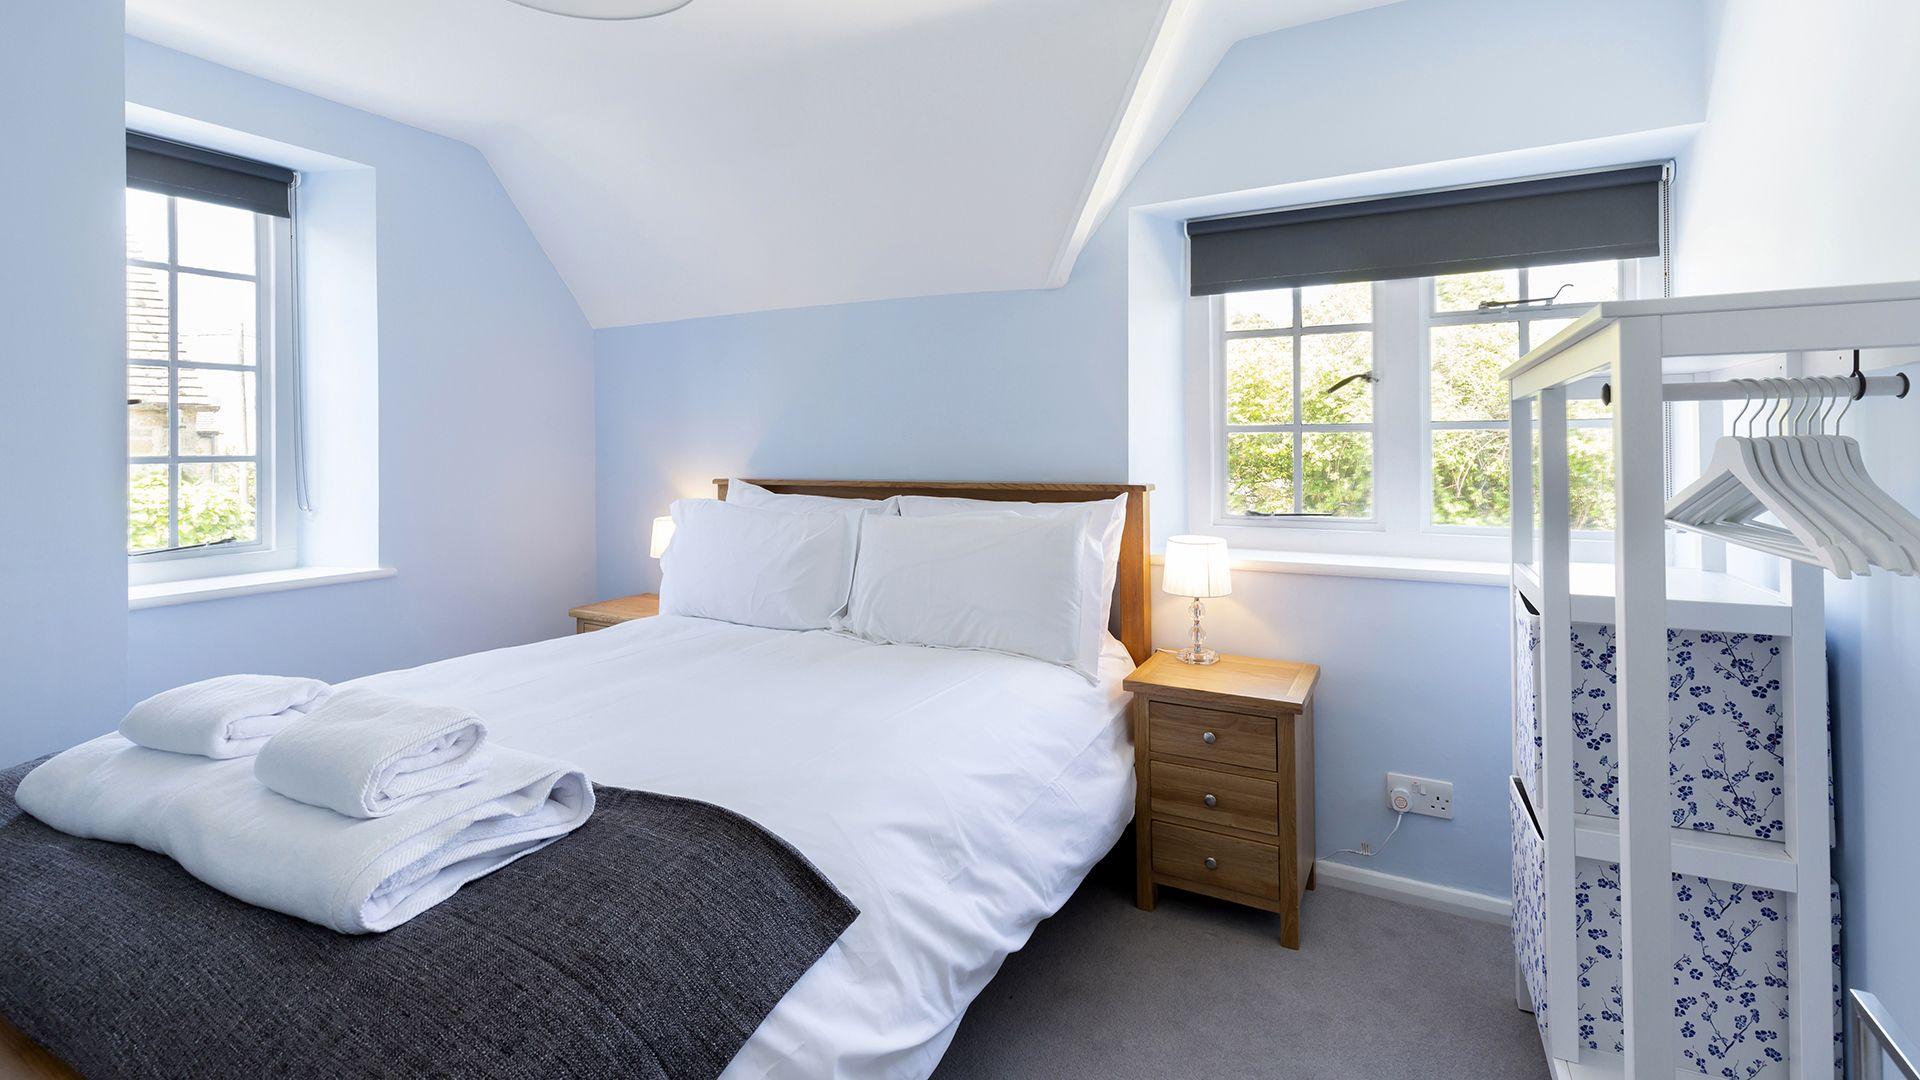 Bedroom 3, South Winds, Bolthole Retreats